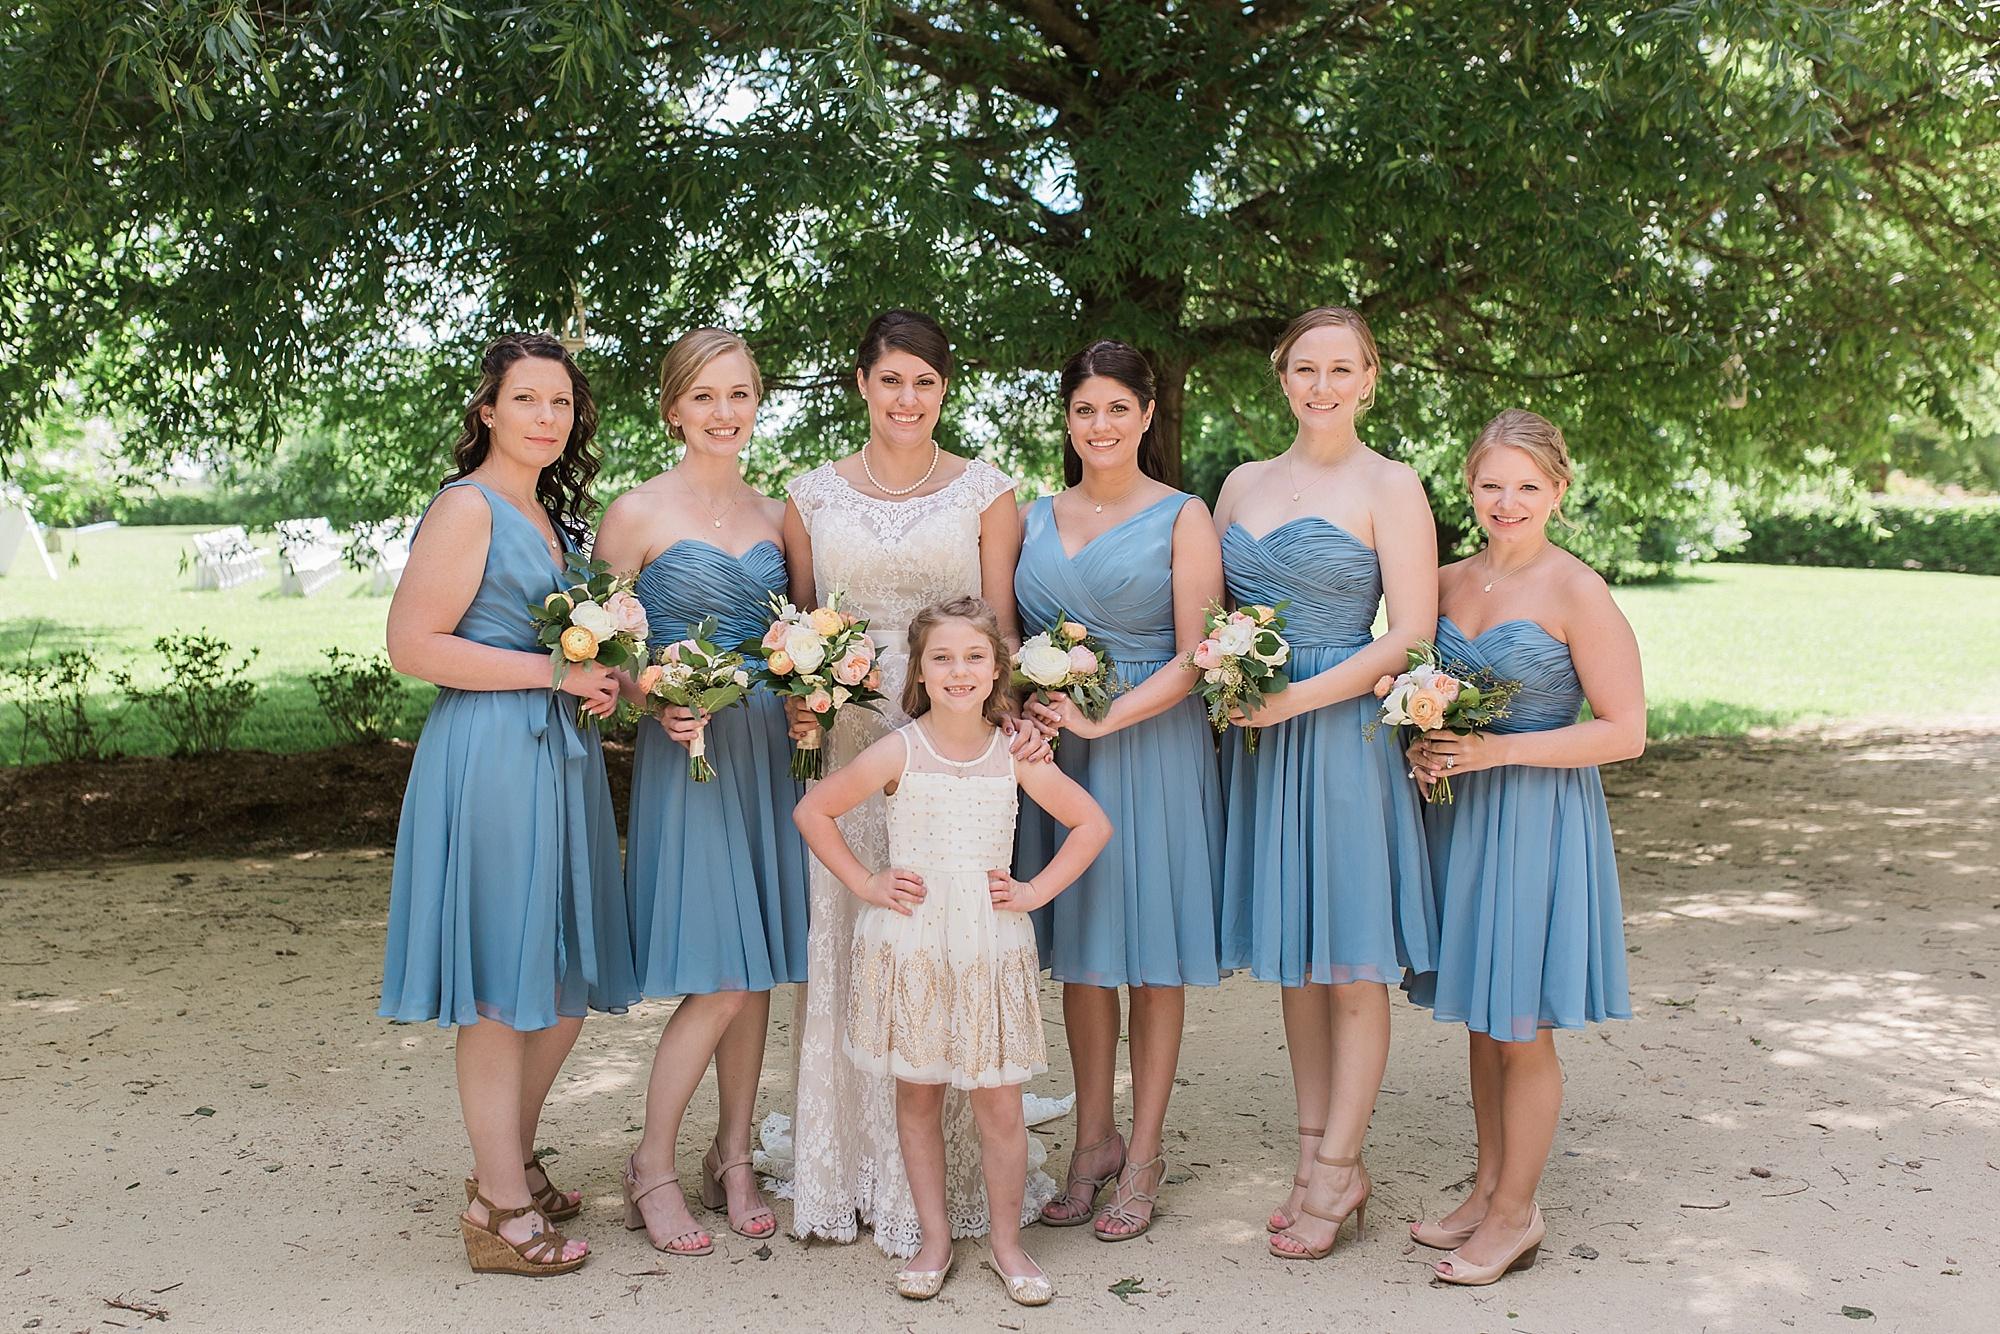 Periwinkle blue bridesmaid dresses